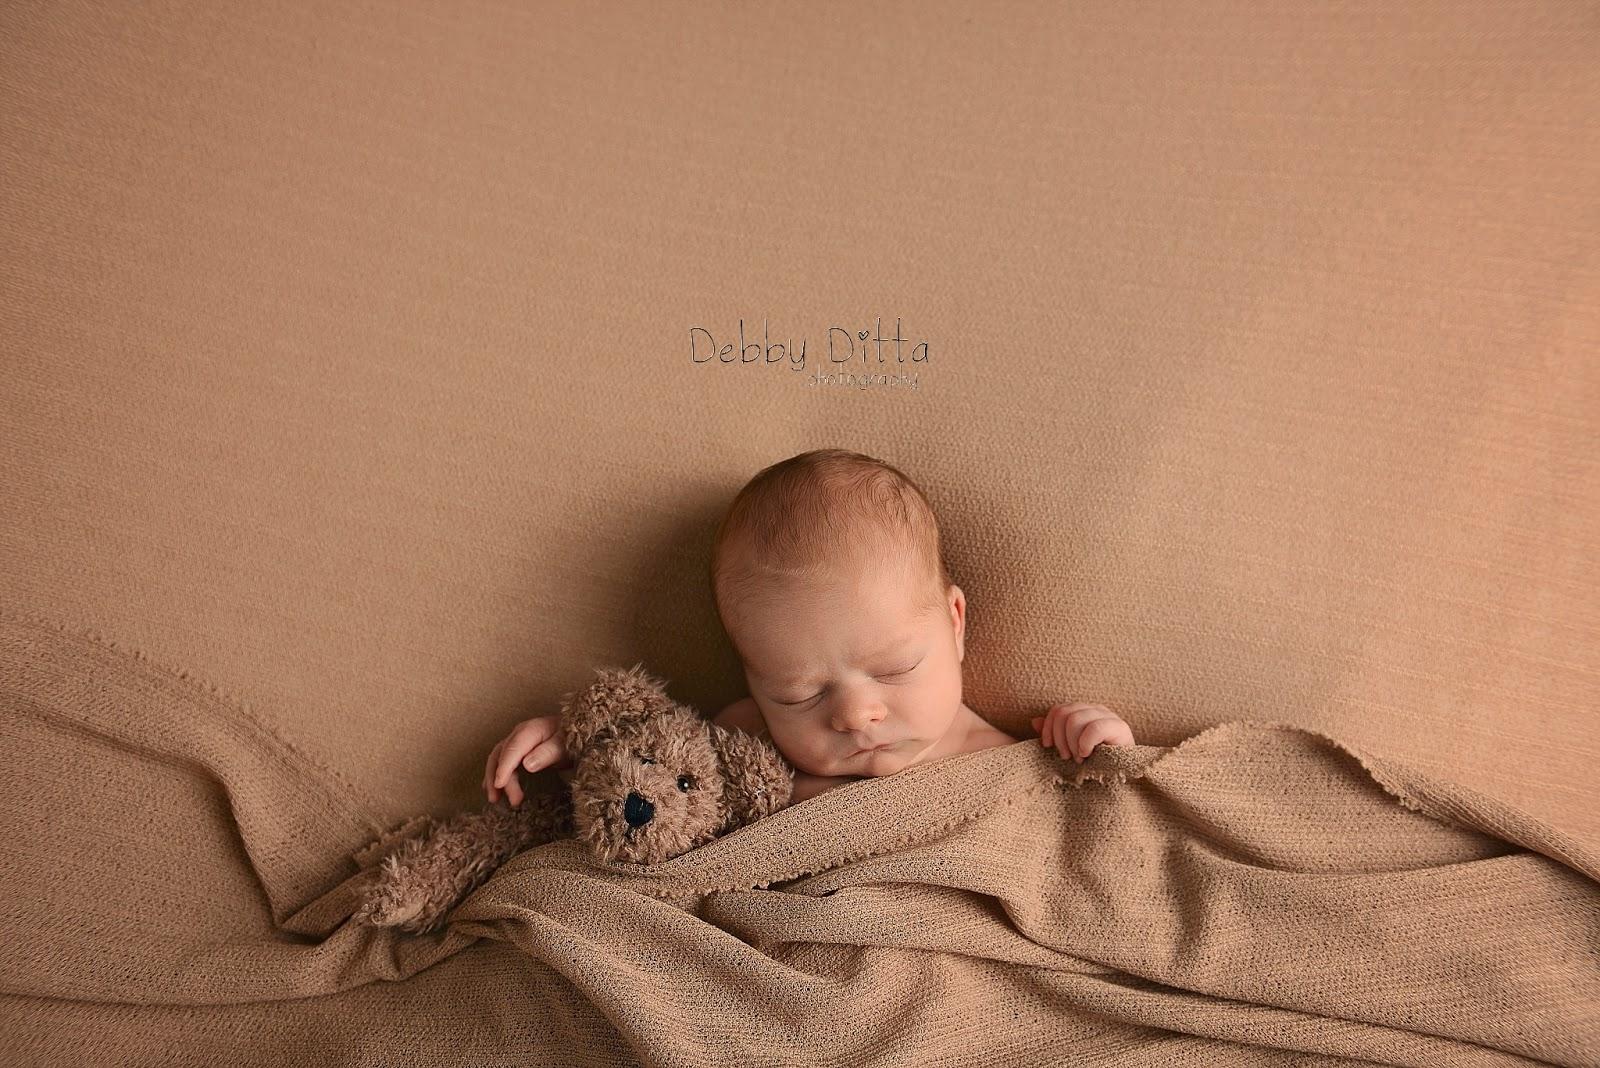 Debby Ditta Photography: Colton 16 days old Newborn baby boy